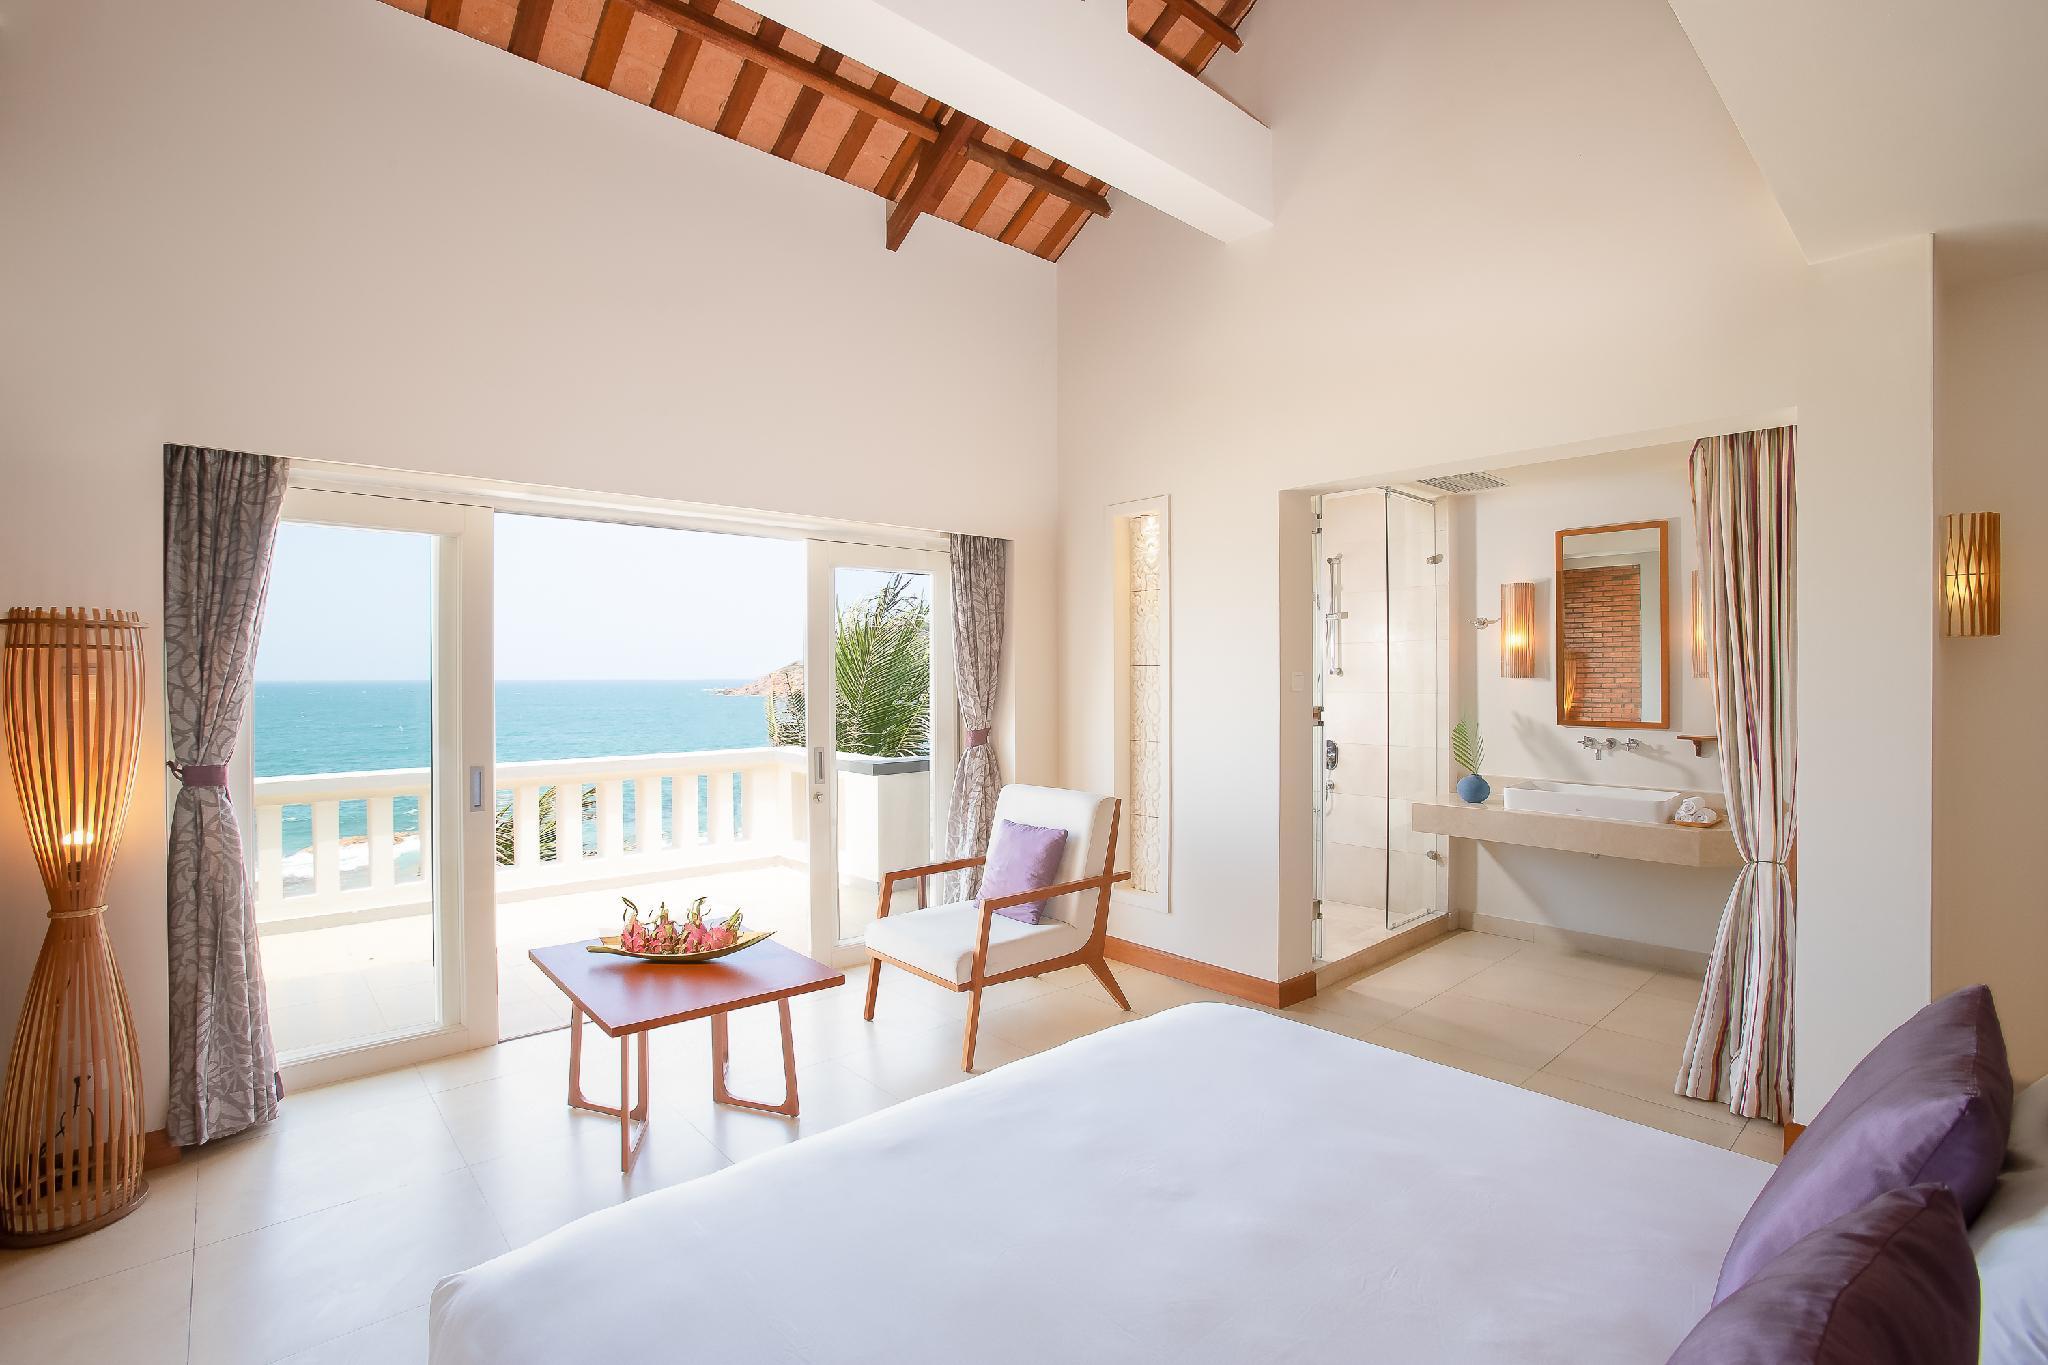 Best Price on Avani Quy Nhon Resort in Quy Nhon (Binh Dinh) + Reviews!